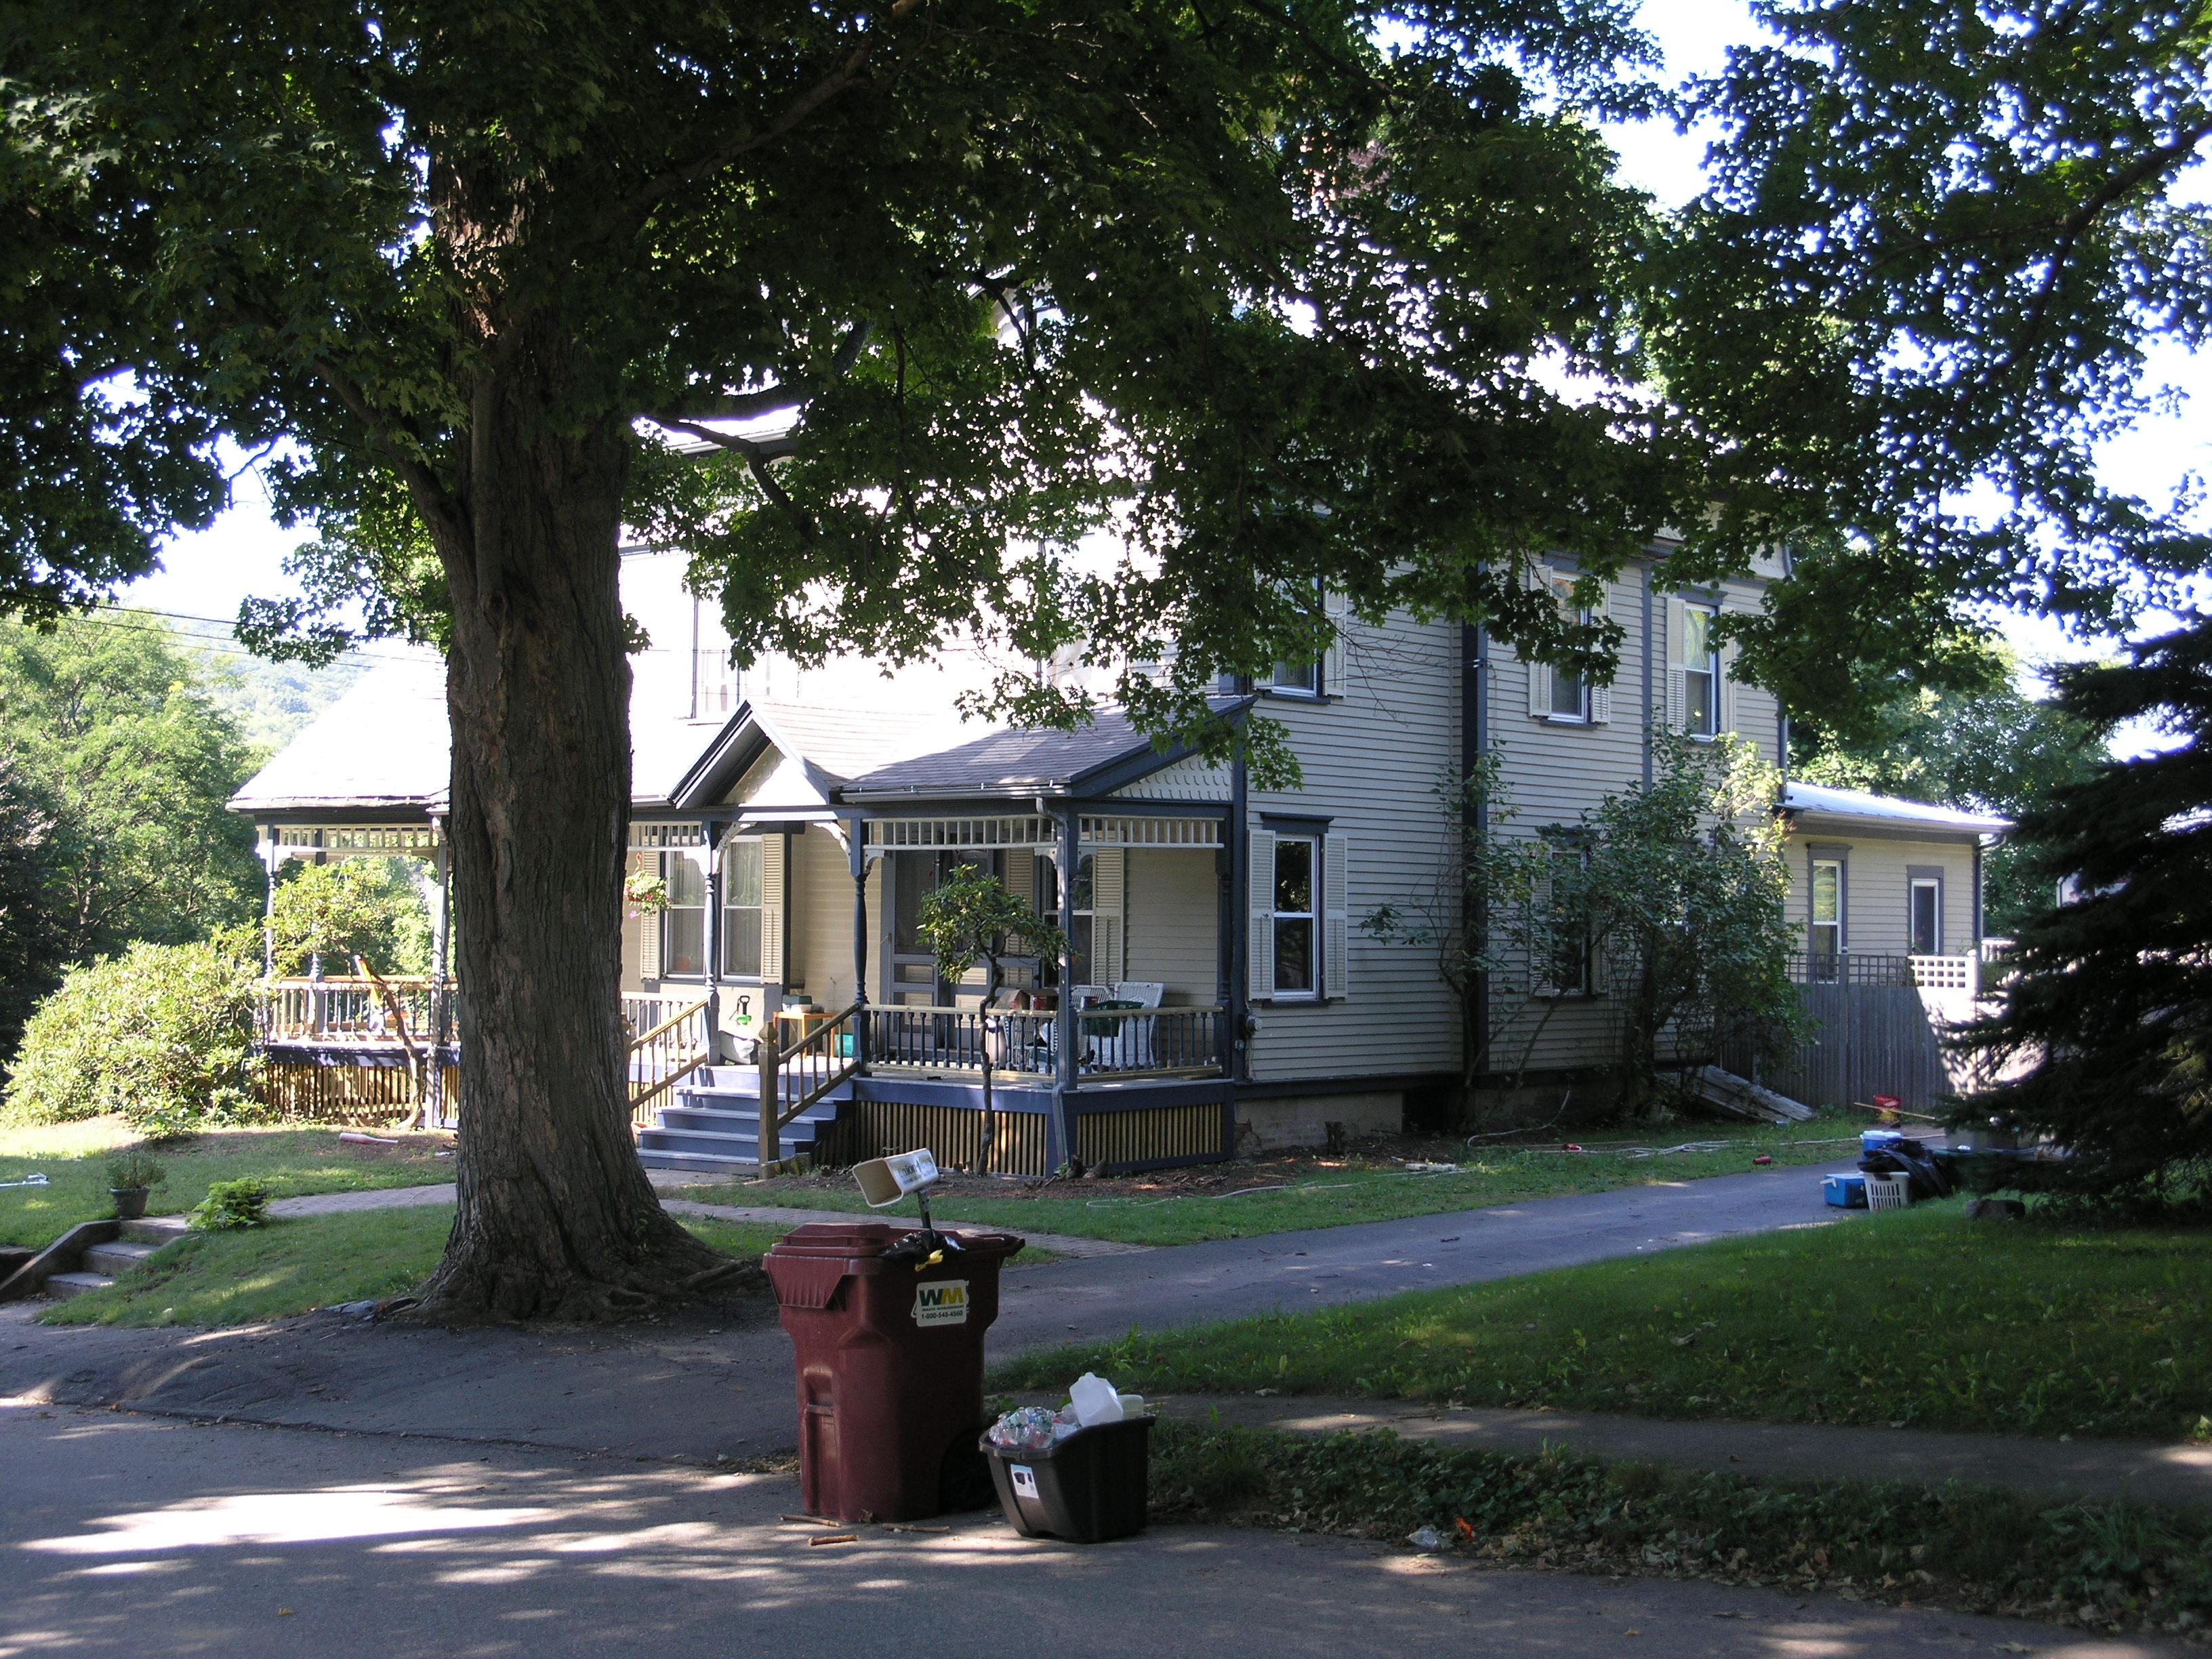 cuddys residence